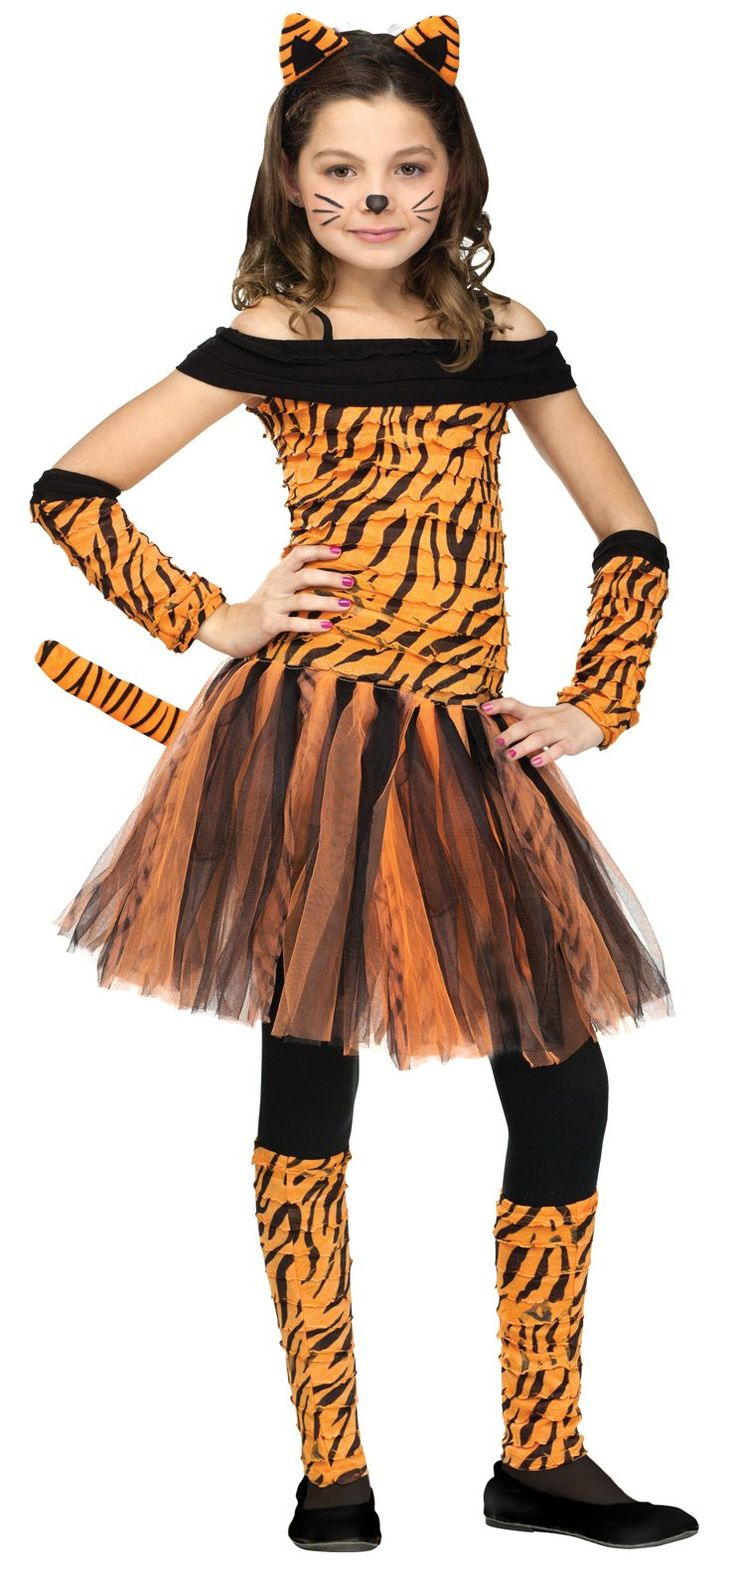 Tiger girl (zookeeper theme)